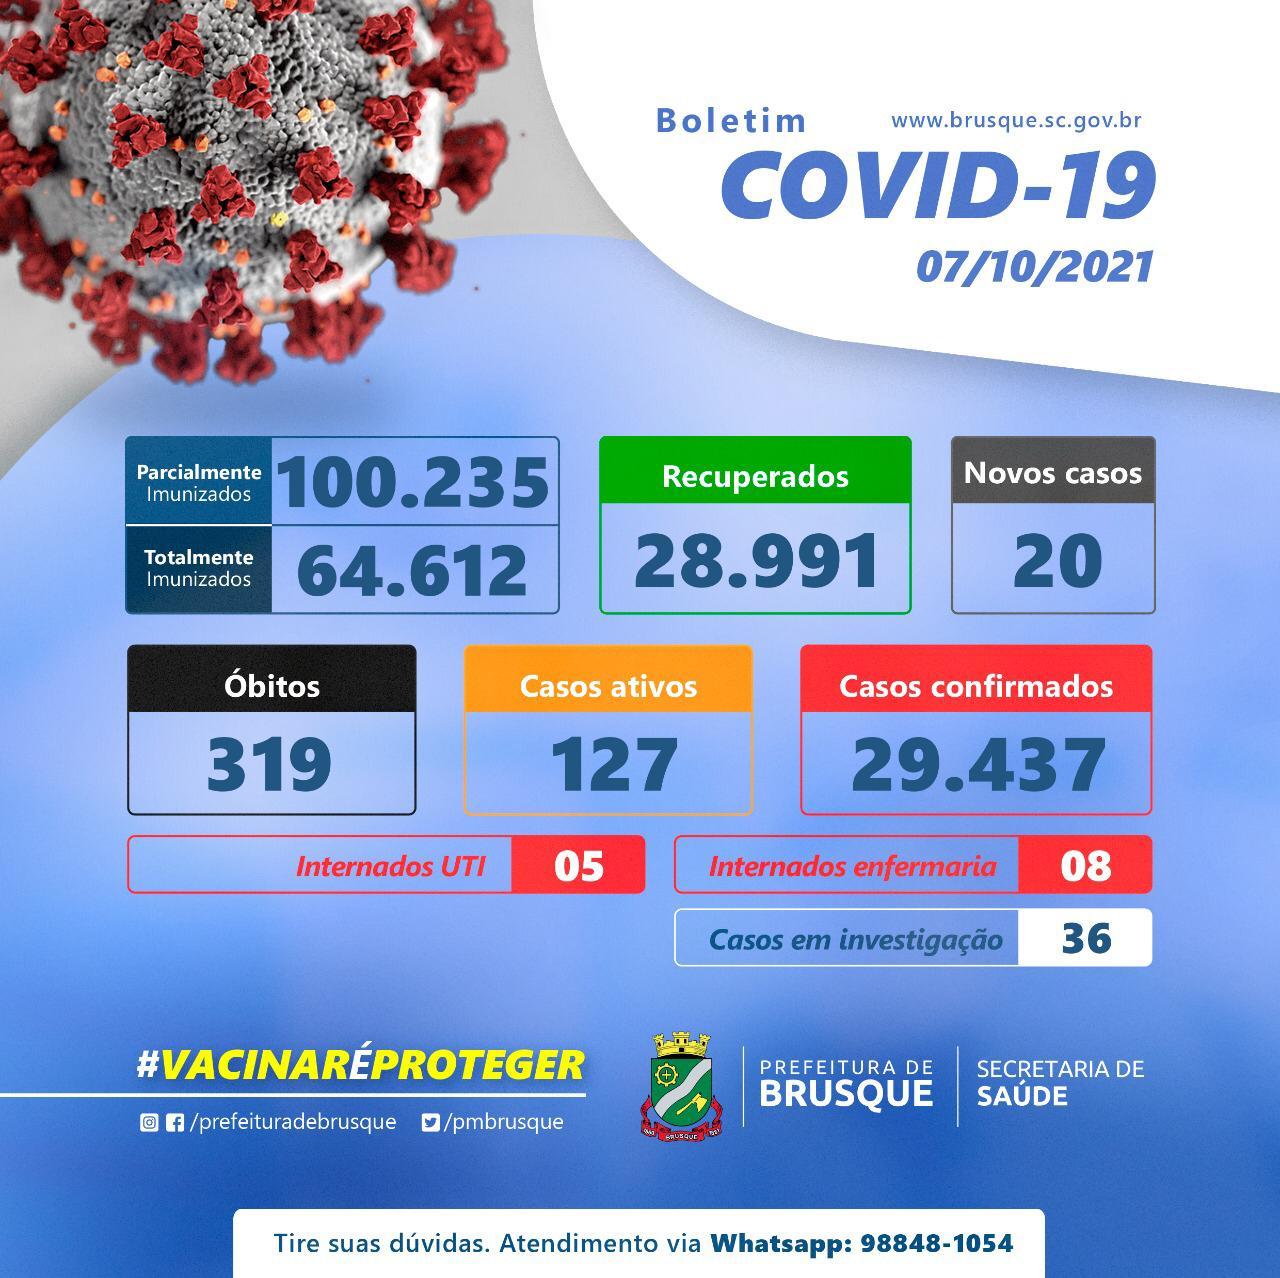 Covid-19: Confira o boletim epidemiológico desta quinta-feira (07)